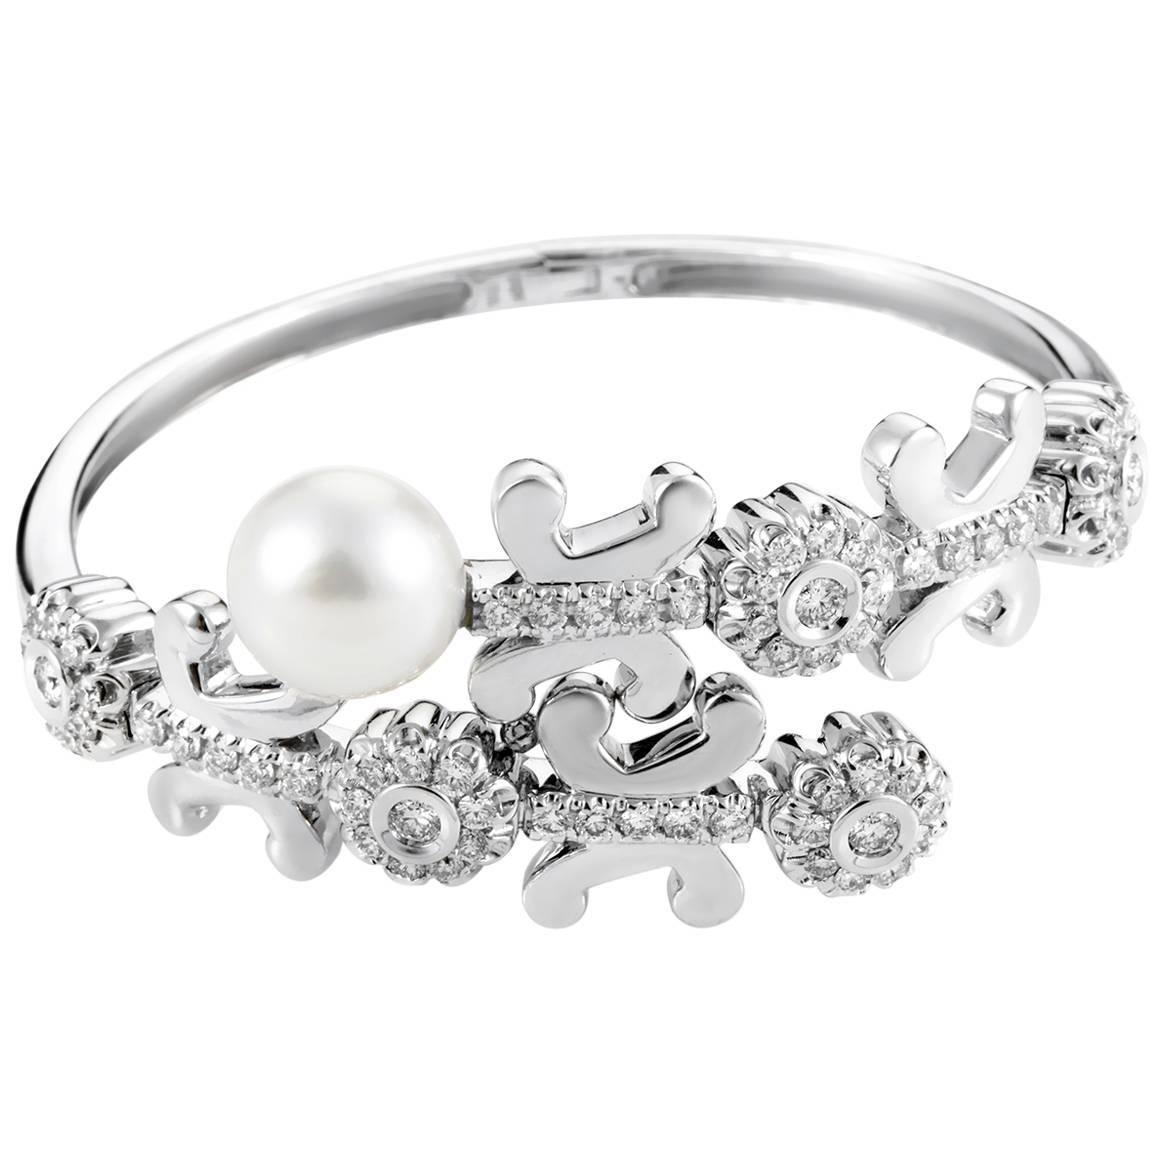 Korloff Pearl Diamond Gold Bangle Bracelet | Pearl diamond, Gold ...